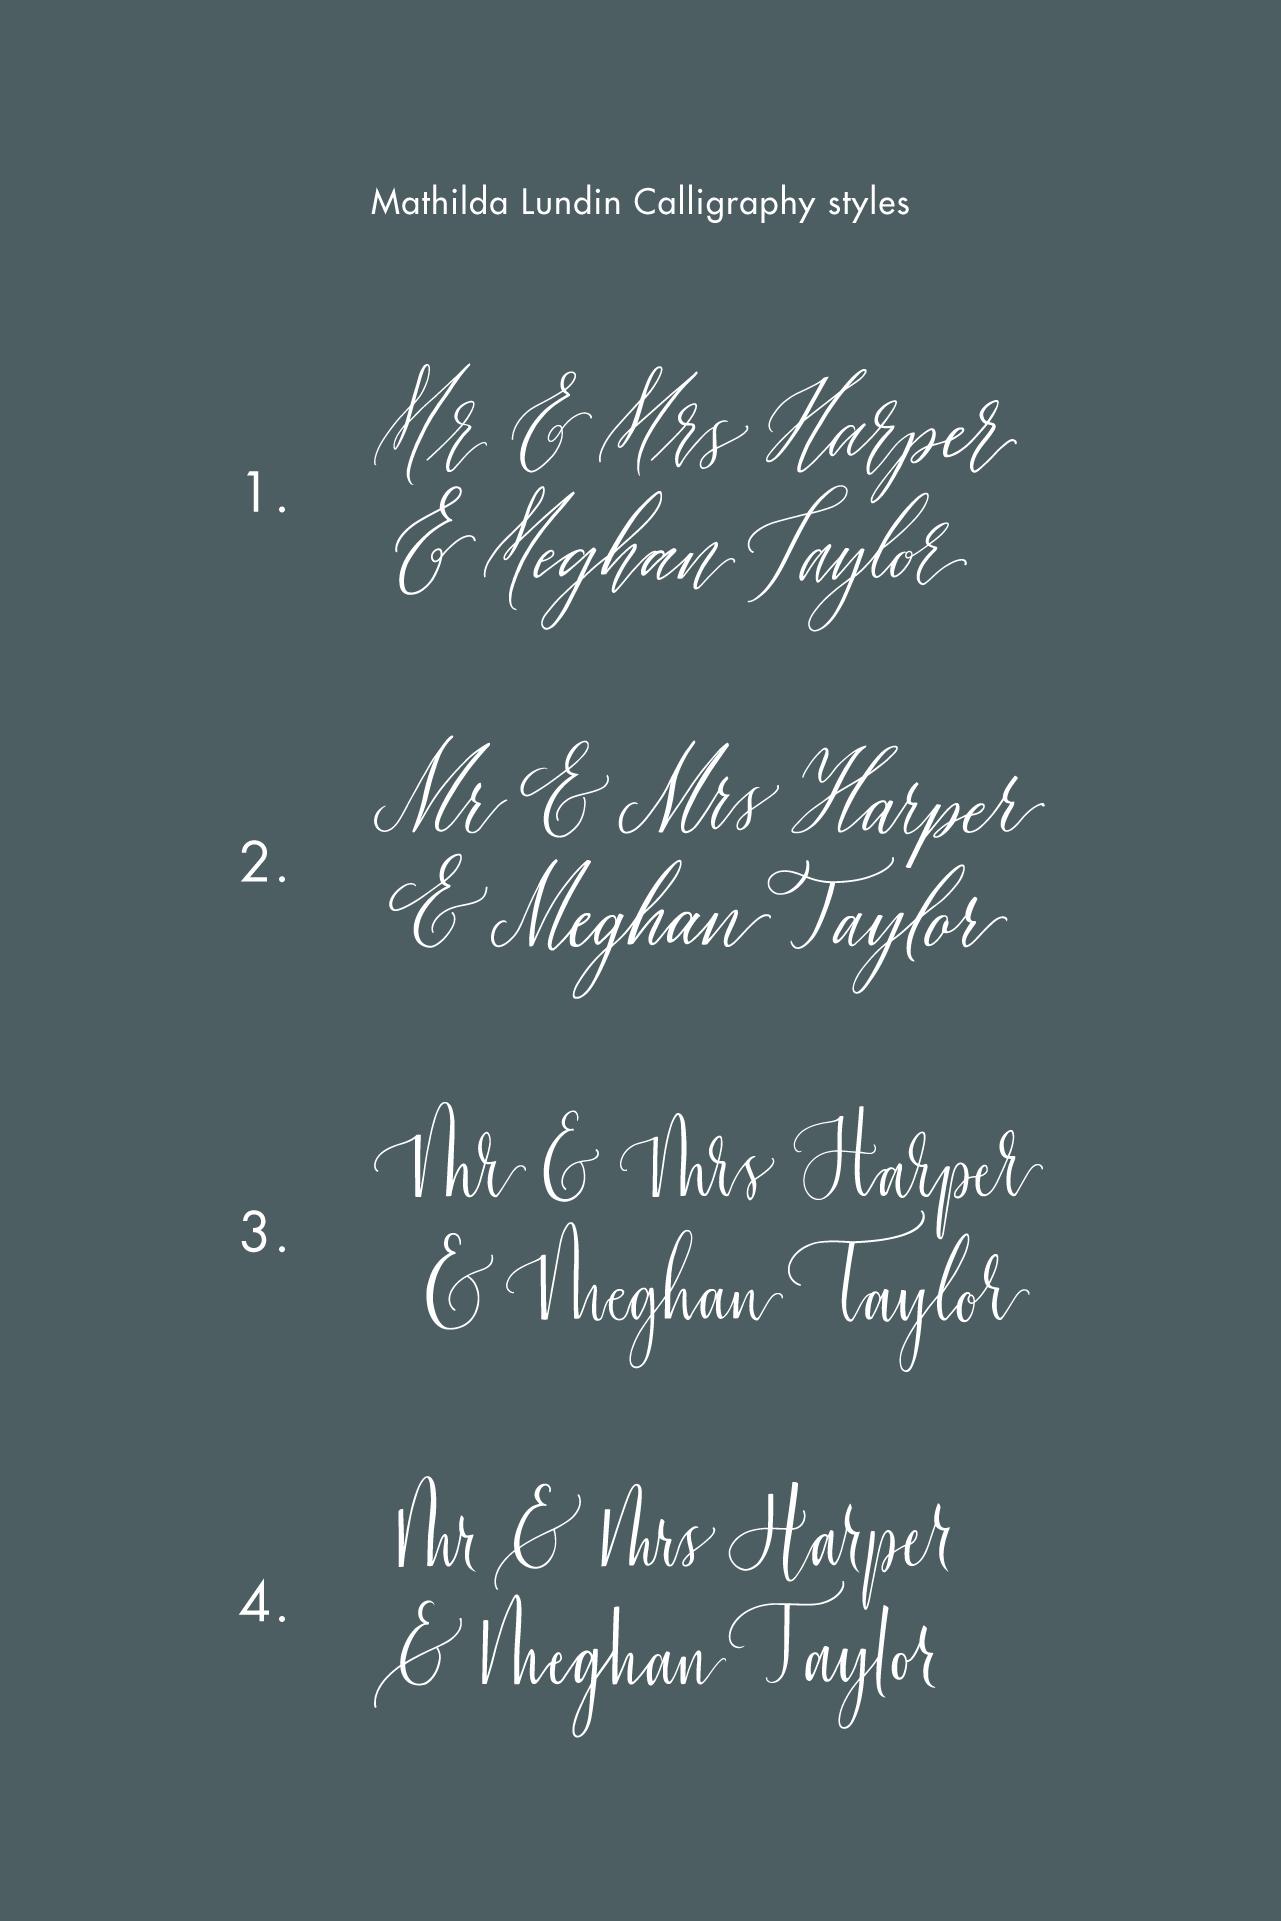 mathilda-lundin-calligraphy-styles_1.png